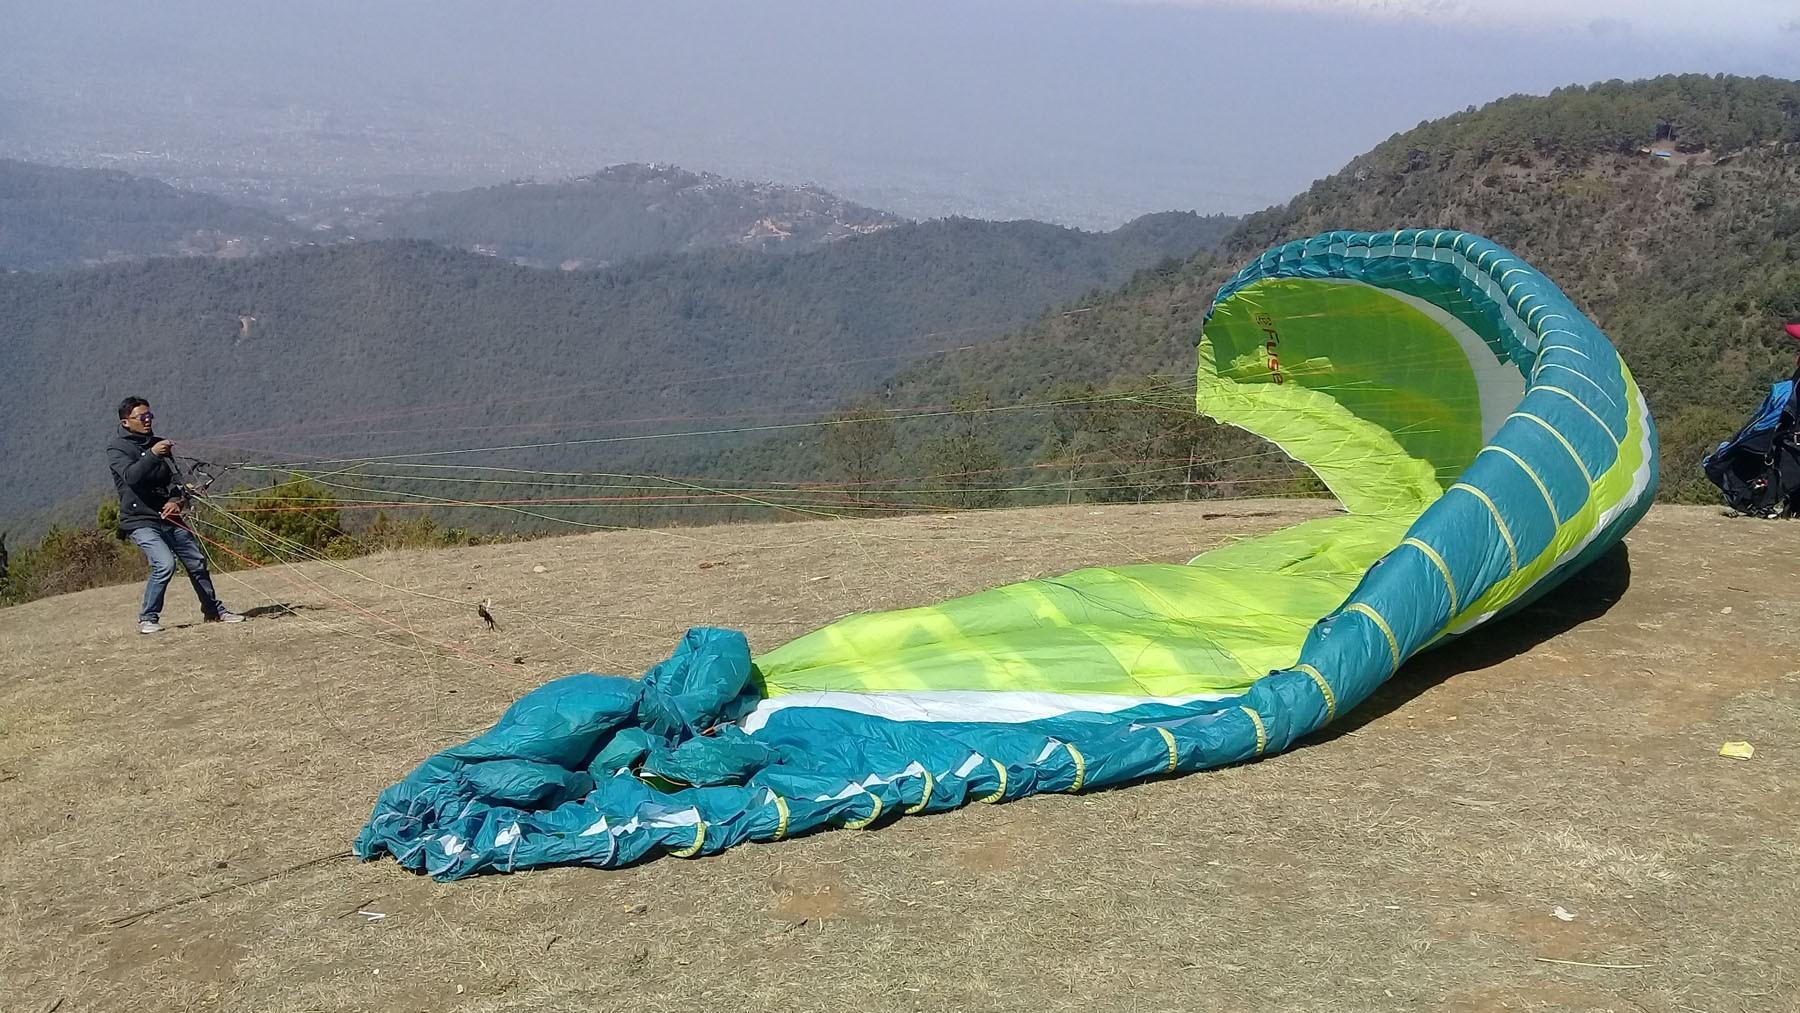 Wanna go paragliding within Kathmandu valley? Then go to Godavari